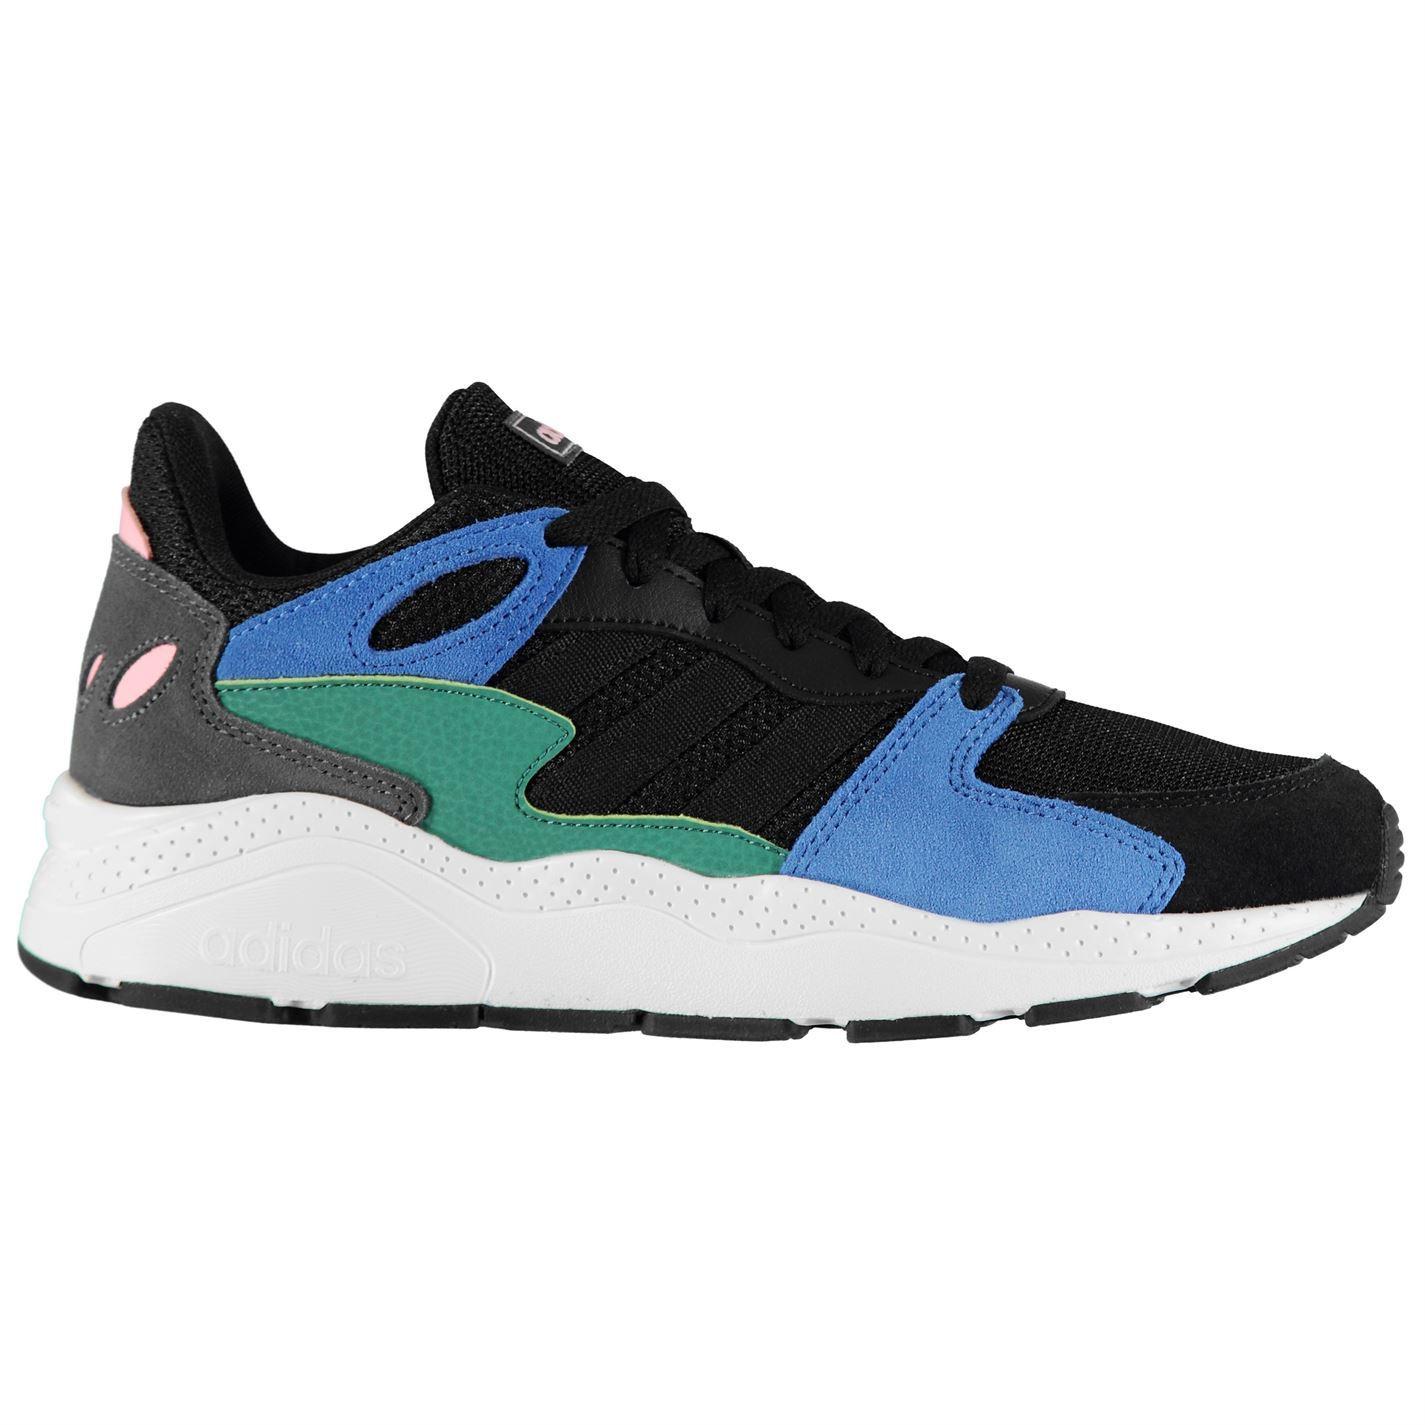 Adidas-Crazychaos-Baskets-Homme-Chaussures-De-Loisirs-Chaussures-Baskets miniature 15